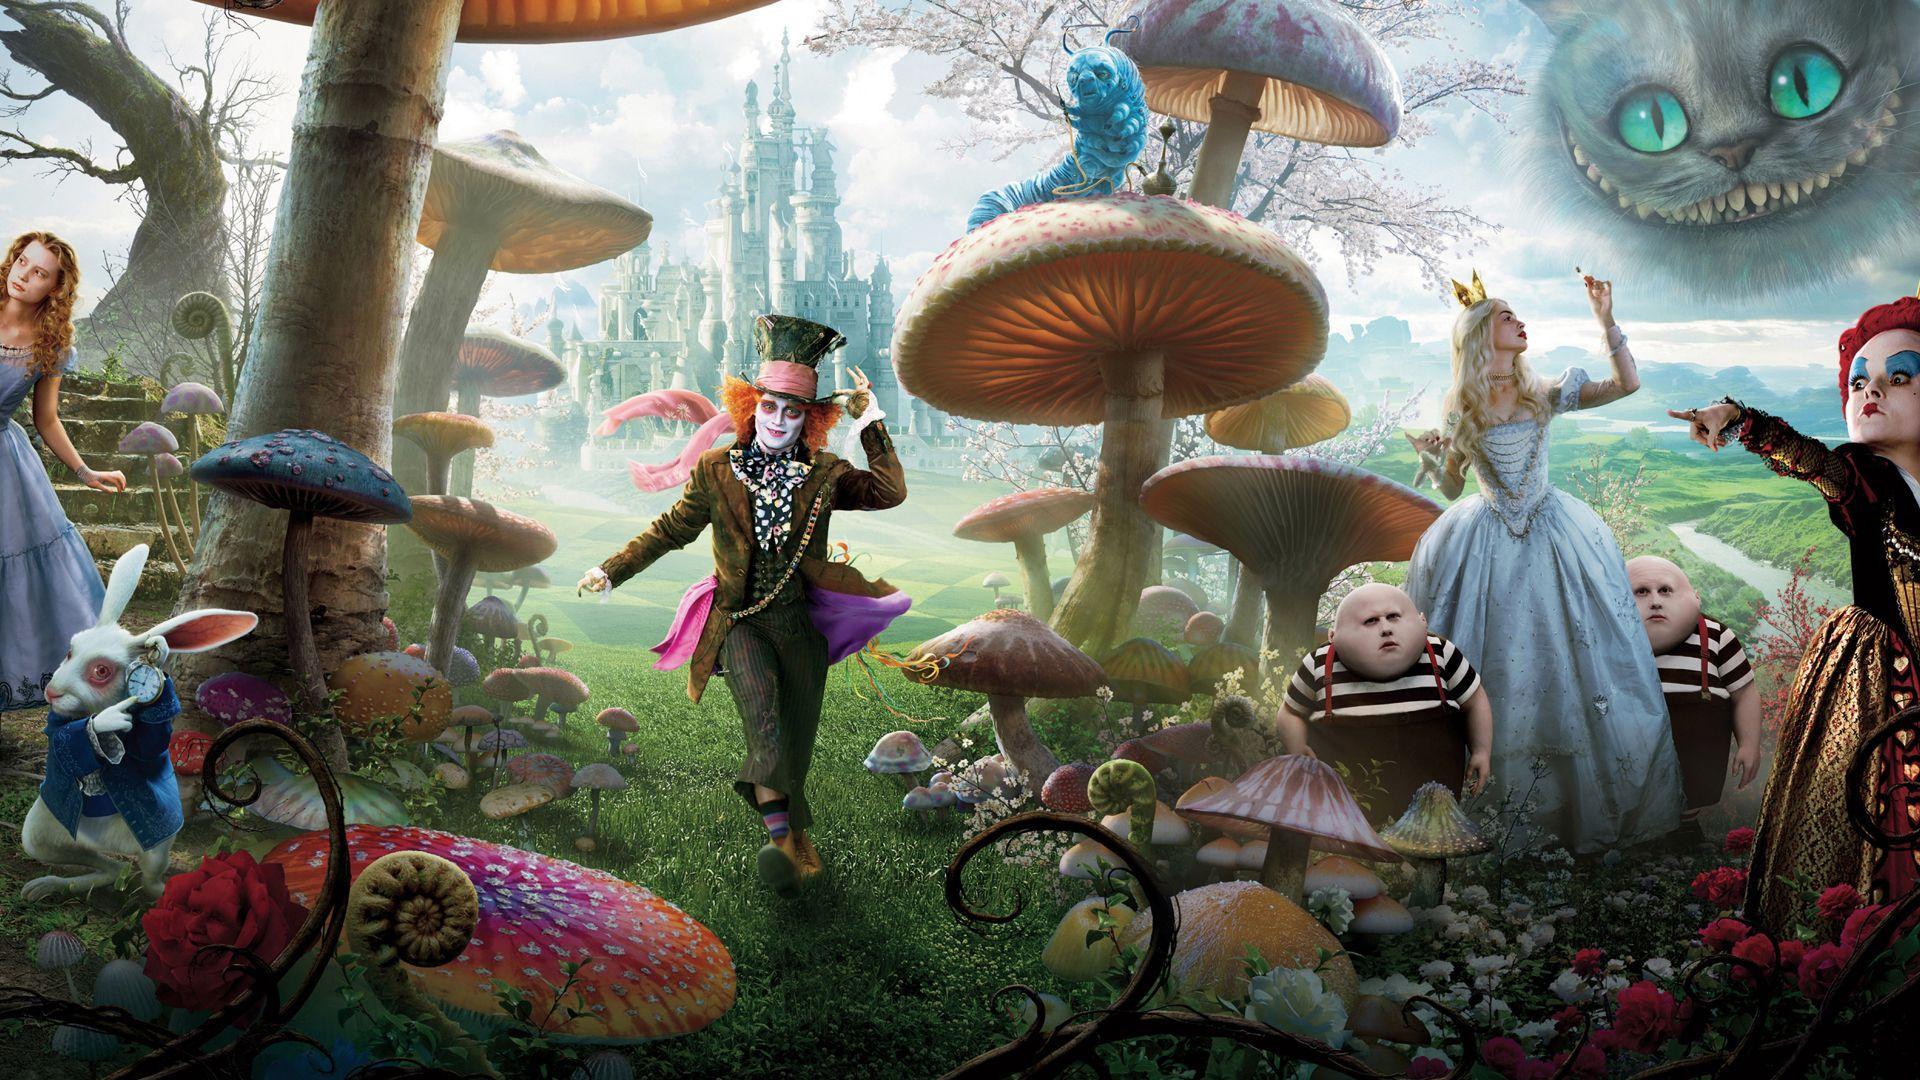 Alice In Wonderland Trippy Wallpapers Top Free Alice In Wonderland